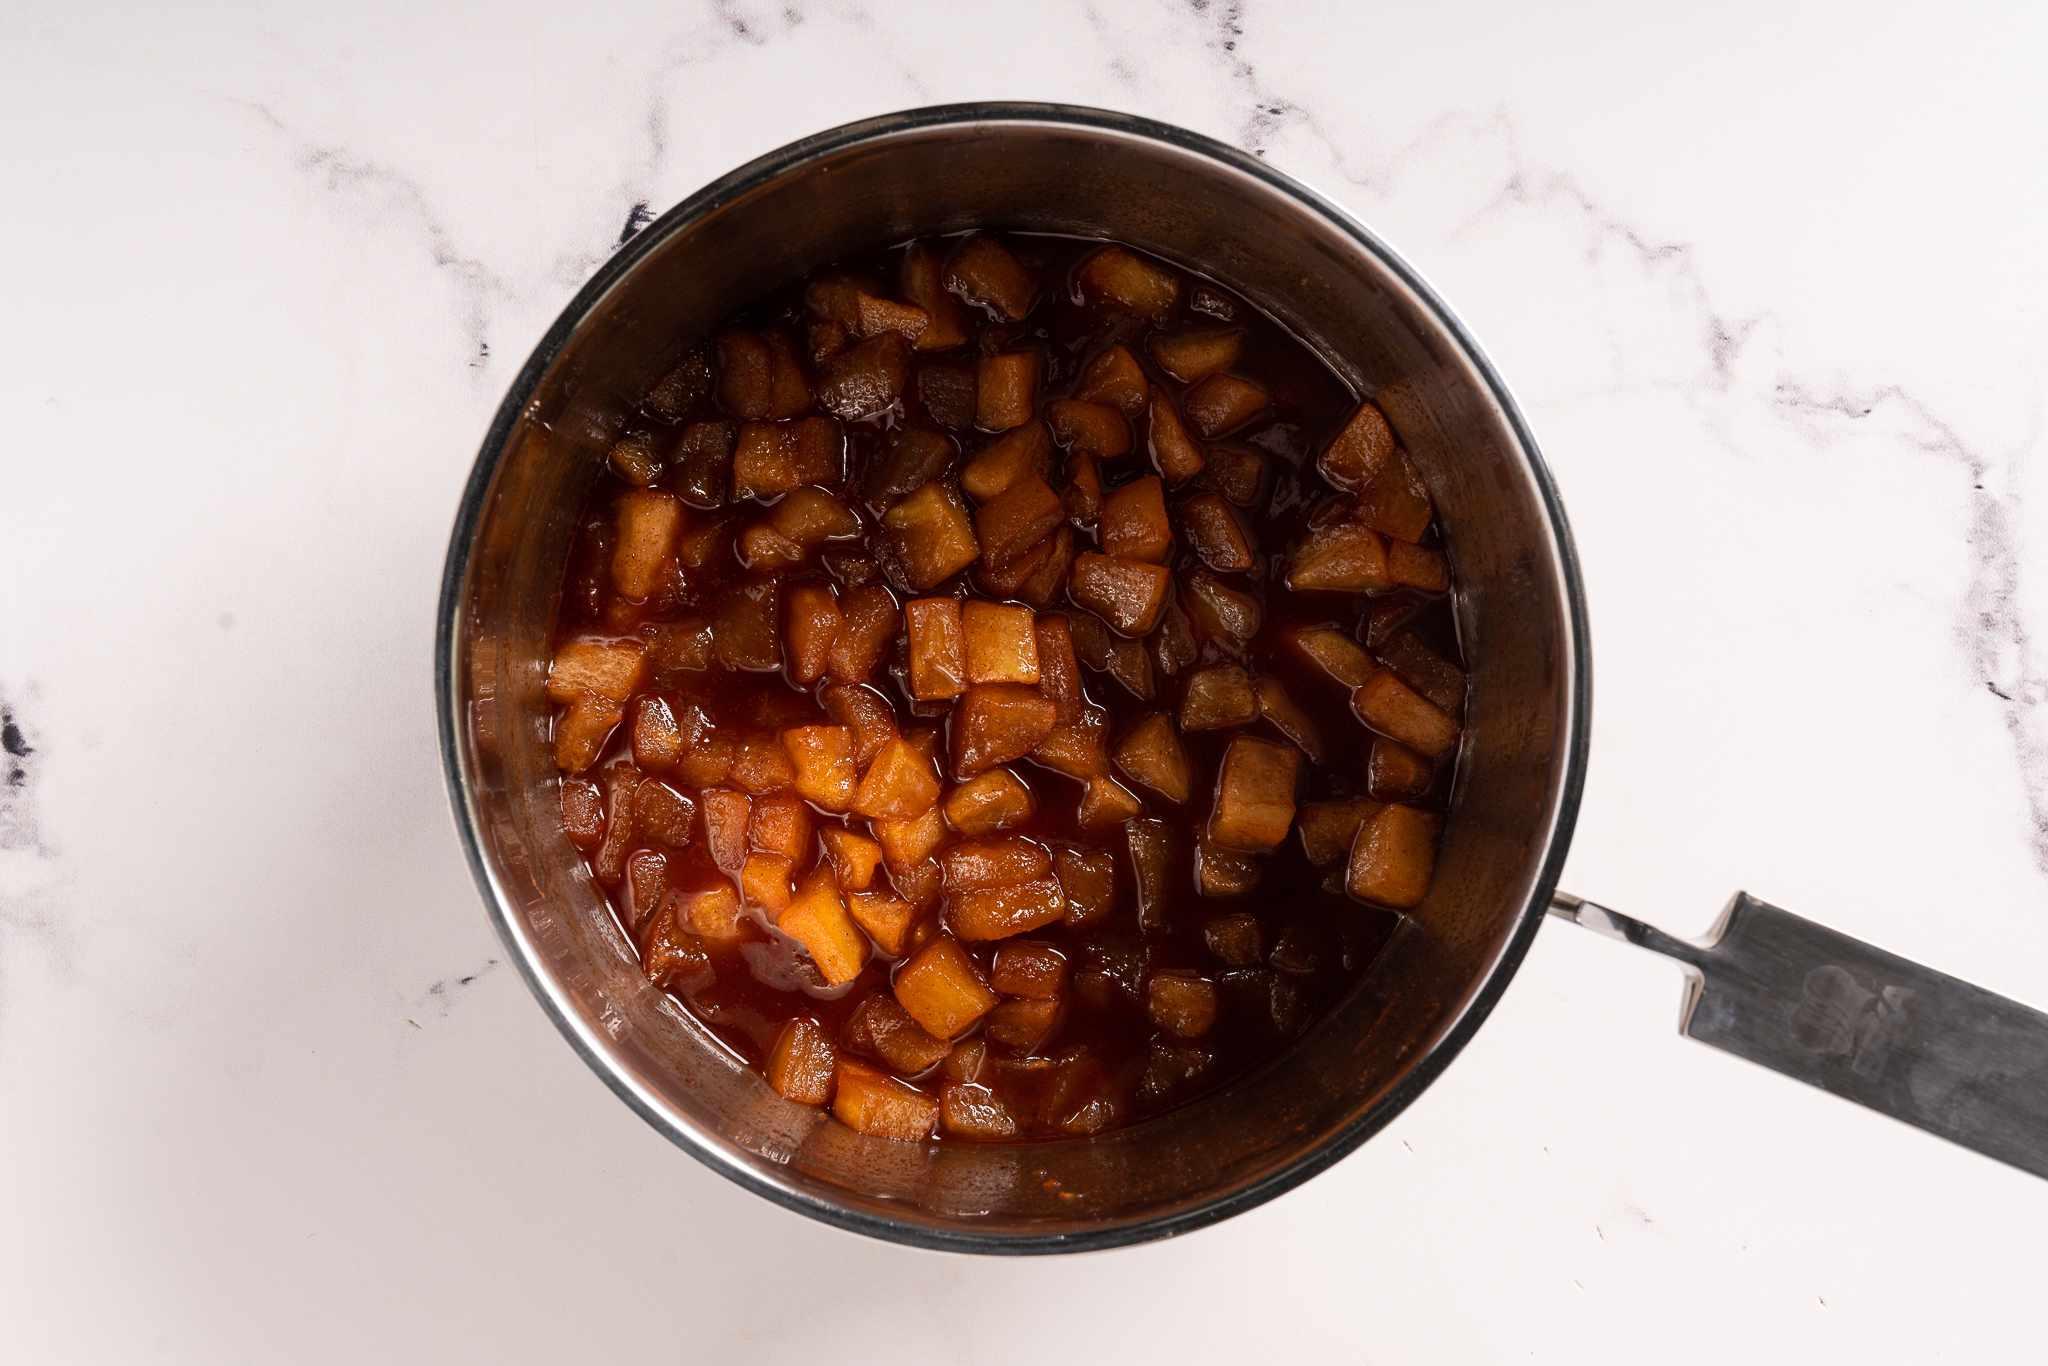 Copycat McDonald's Apple Pie filling in a pot